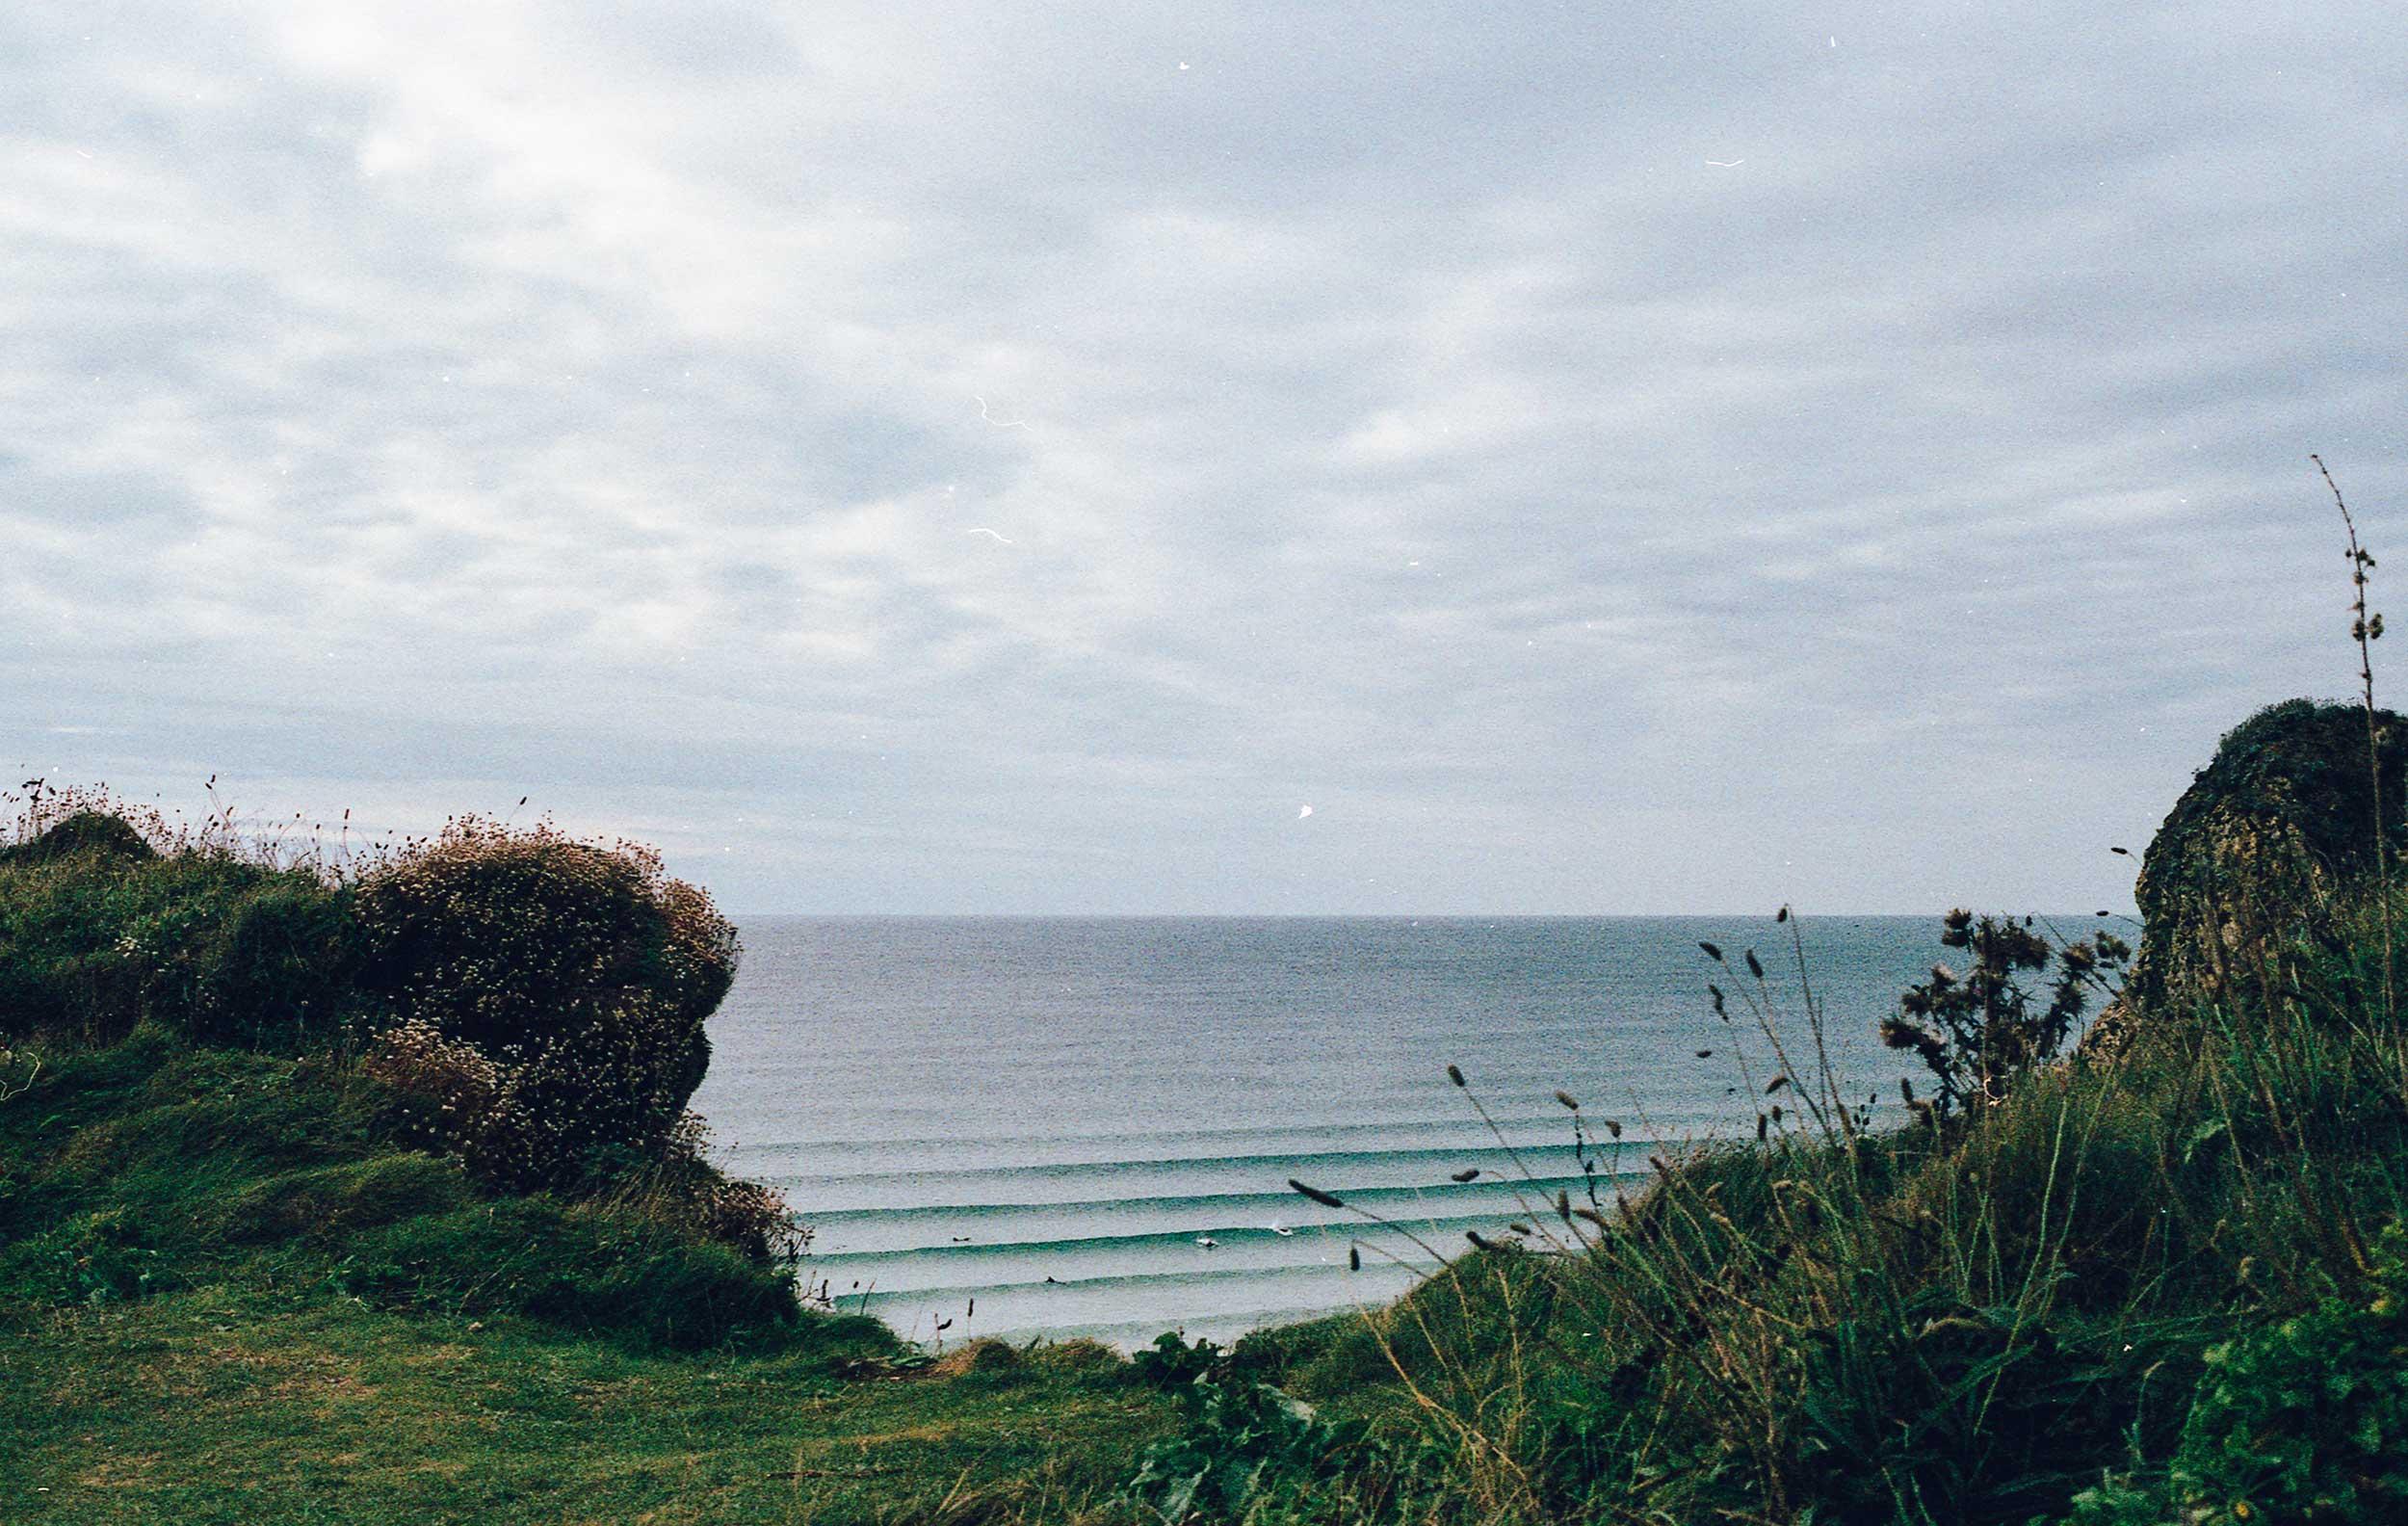 09-24-2018_Surfing-WG-033.jpg